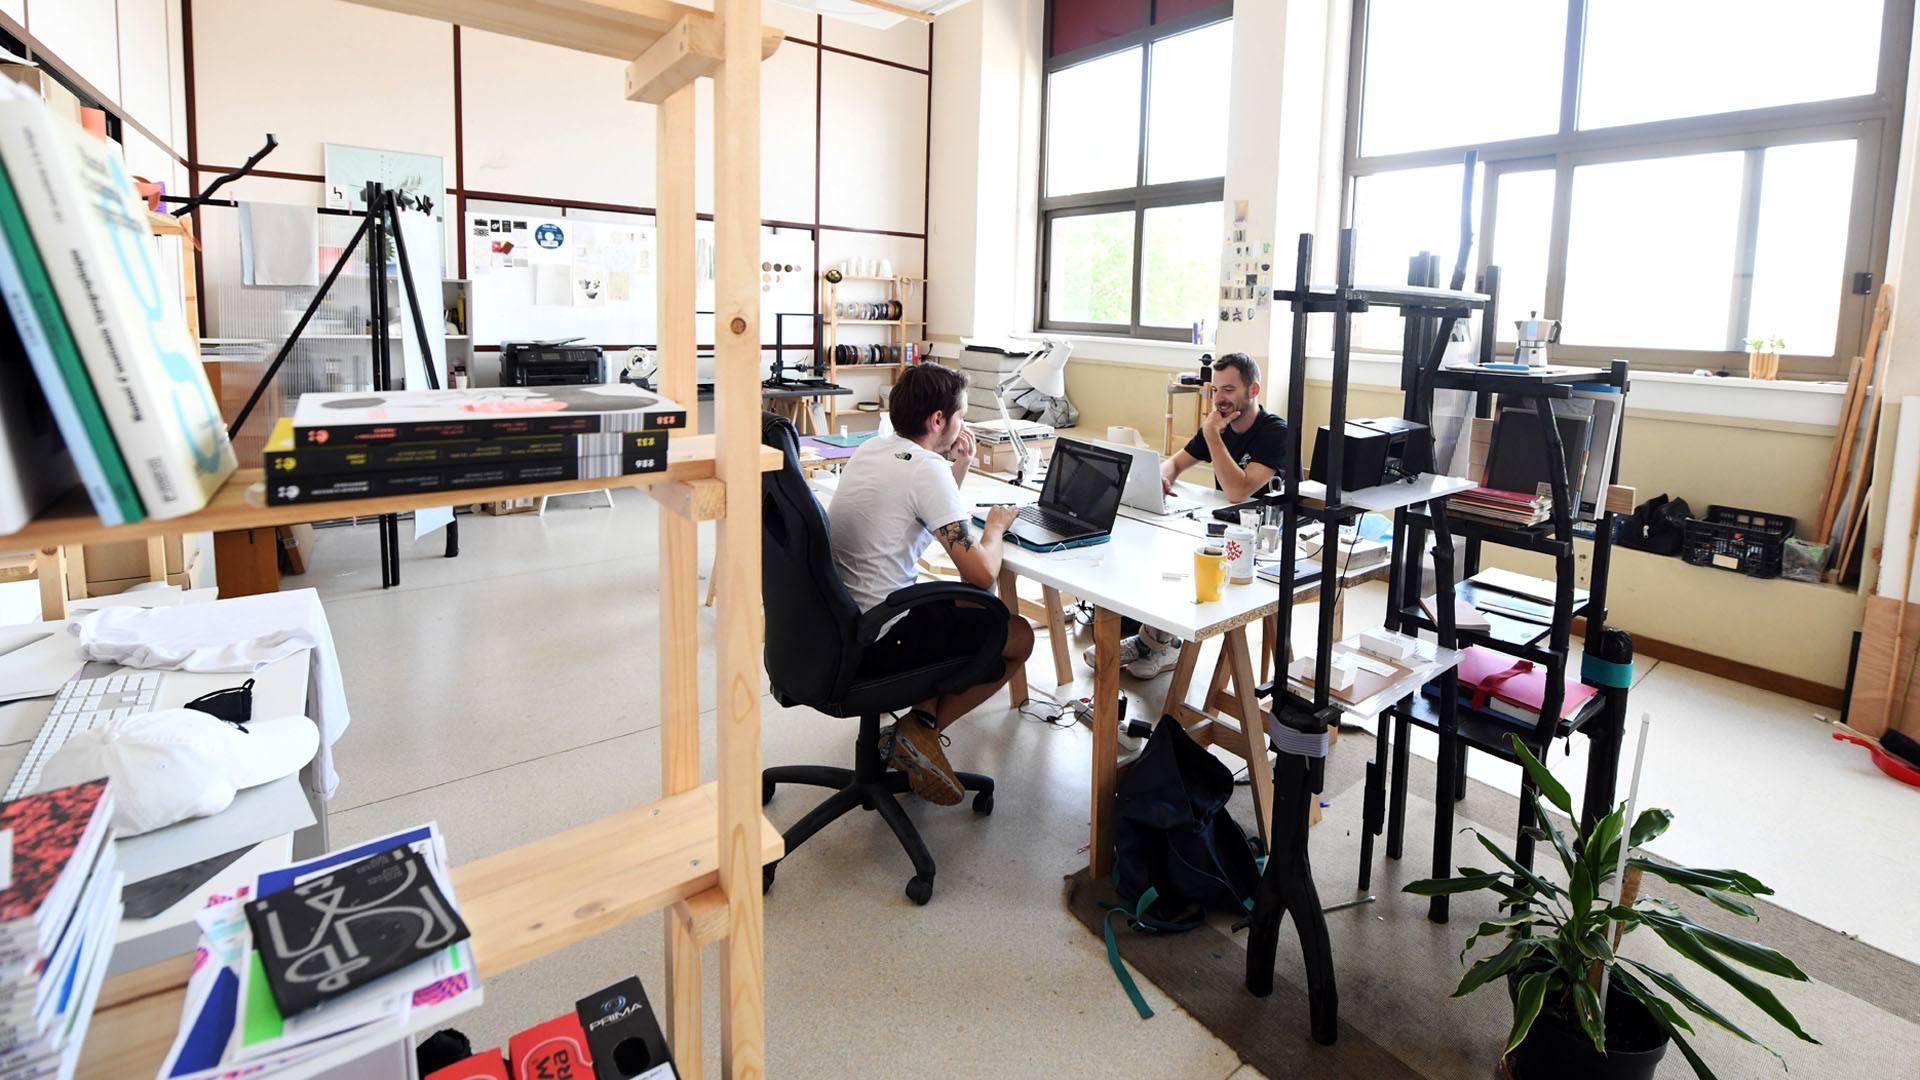 La double clique, studio de design pluridisciplinaire à Motoco